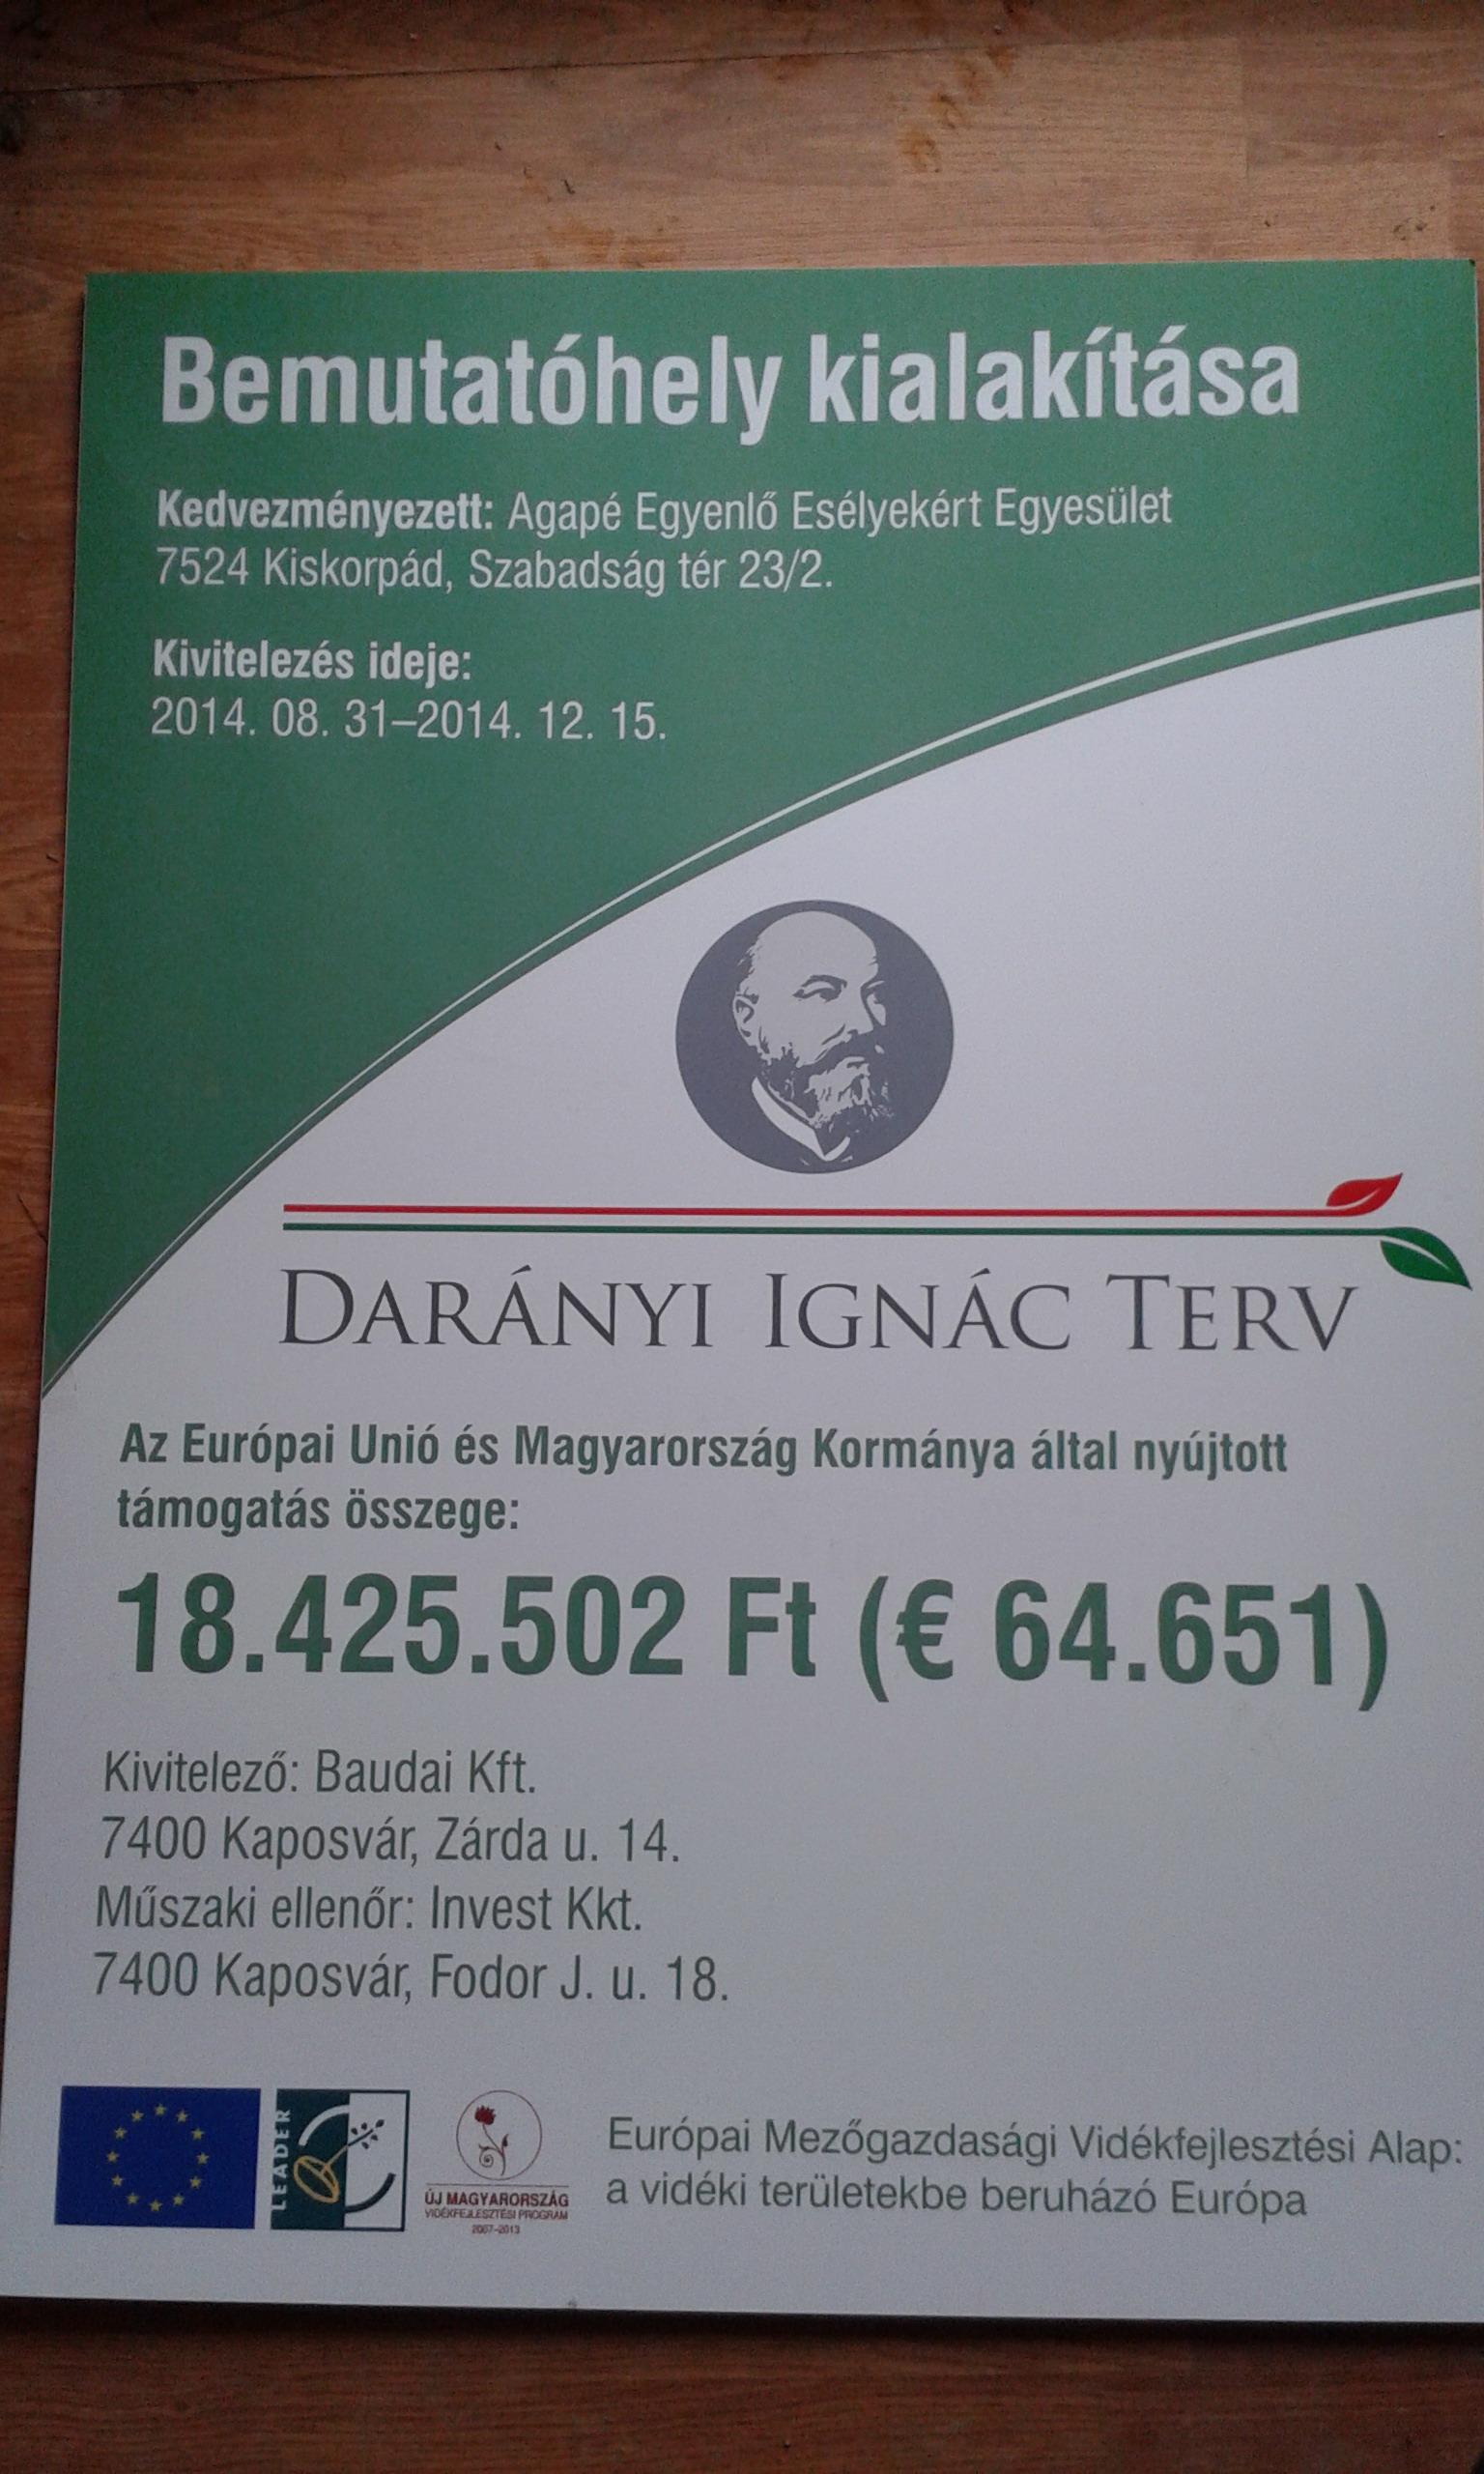 20150205_110118[1]